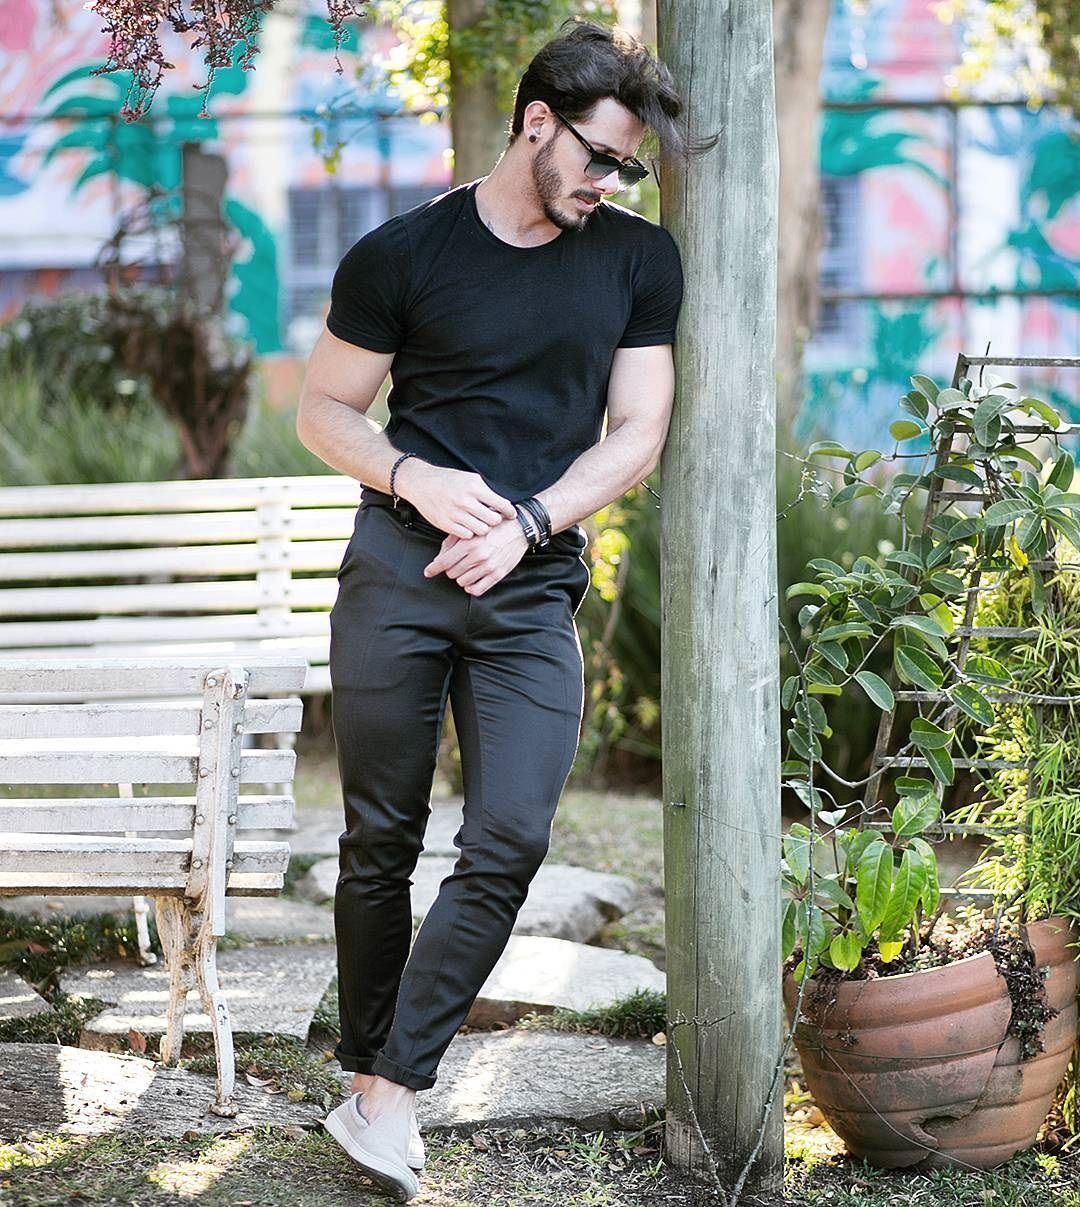 Moda Masculina Men Style Outfit Men Black Look Men Outfit Rodrigo Perek Men Fas Mens Photoshoot Poses Photography Poses For Men Fashion Photography Poses